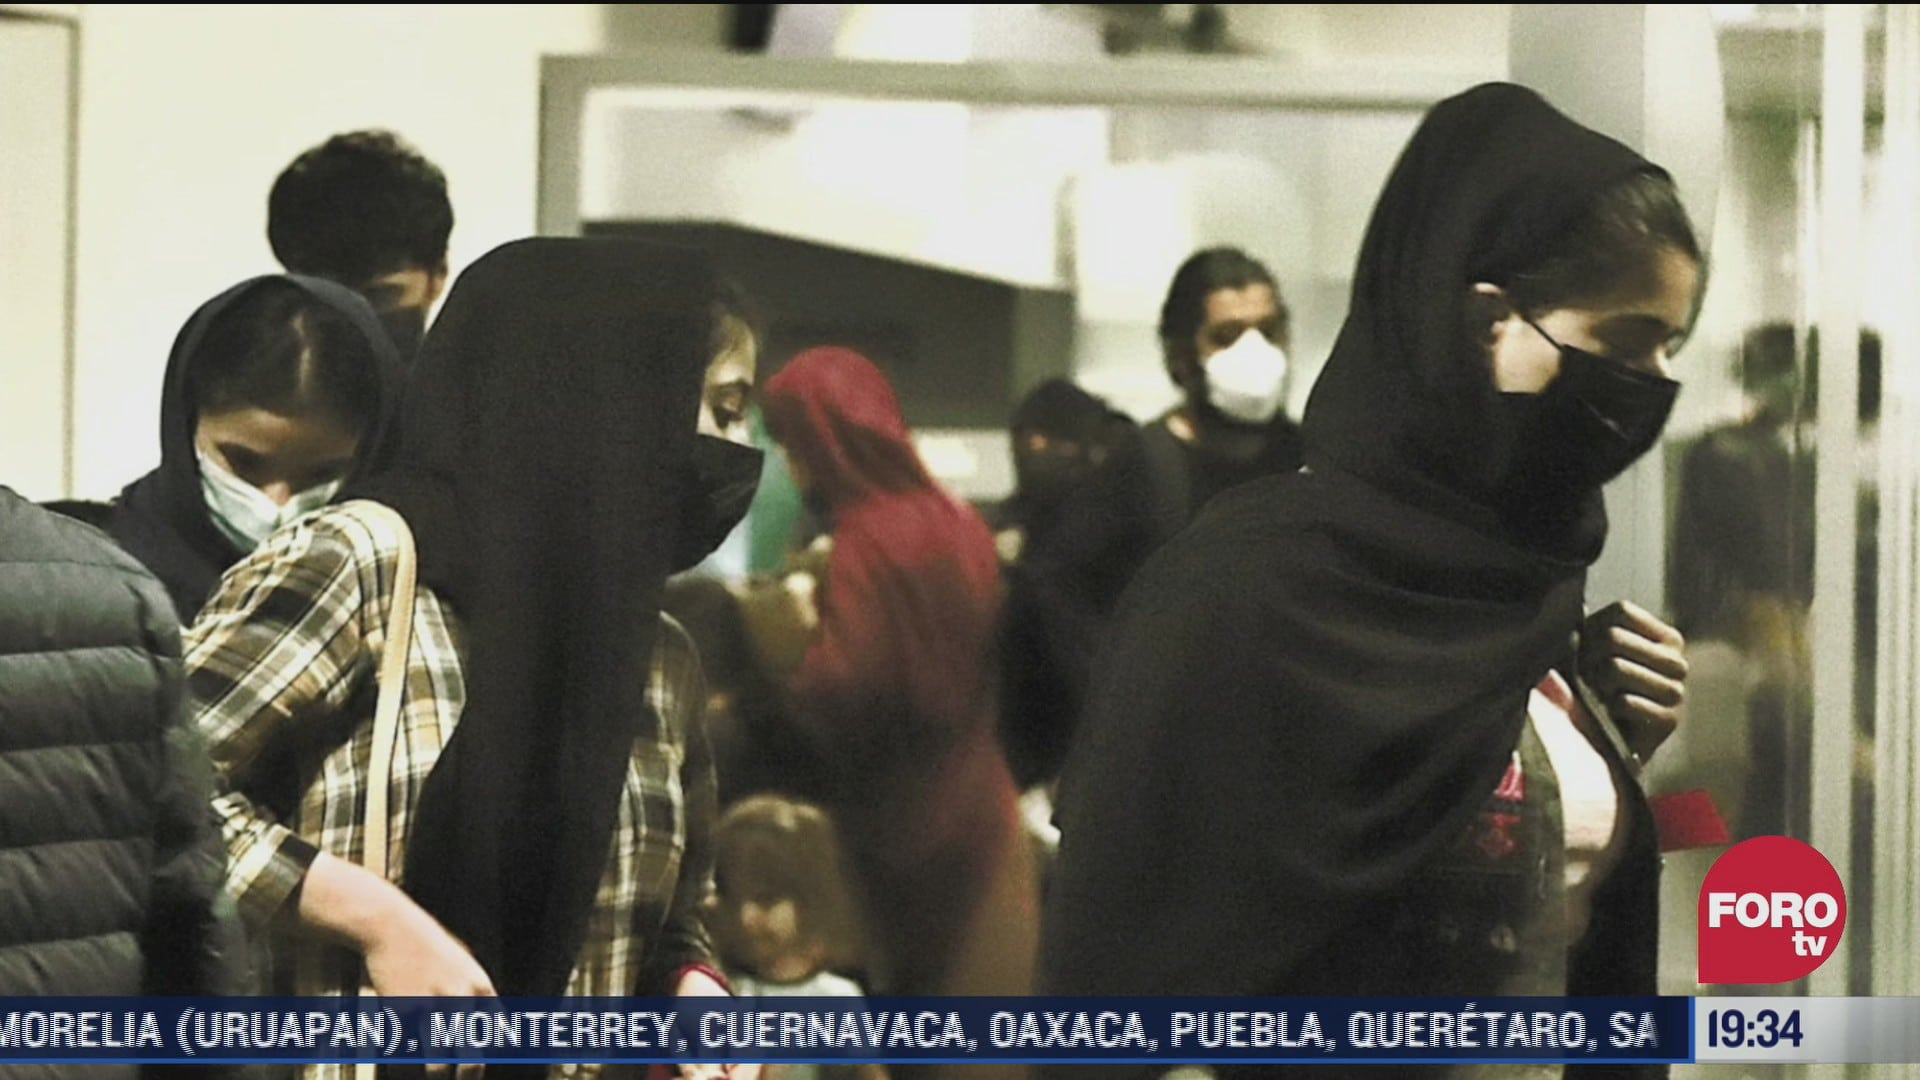 familia afgana inicia proceso para solicitar asilo en mexico